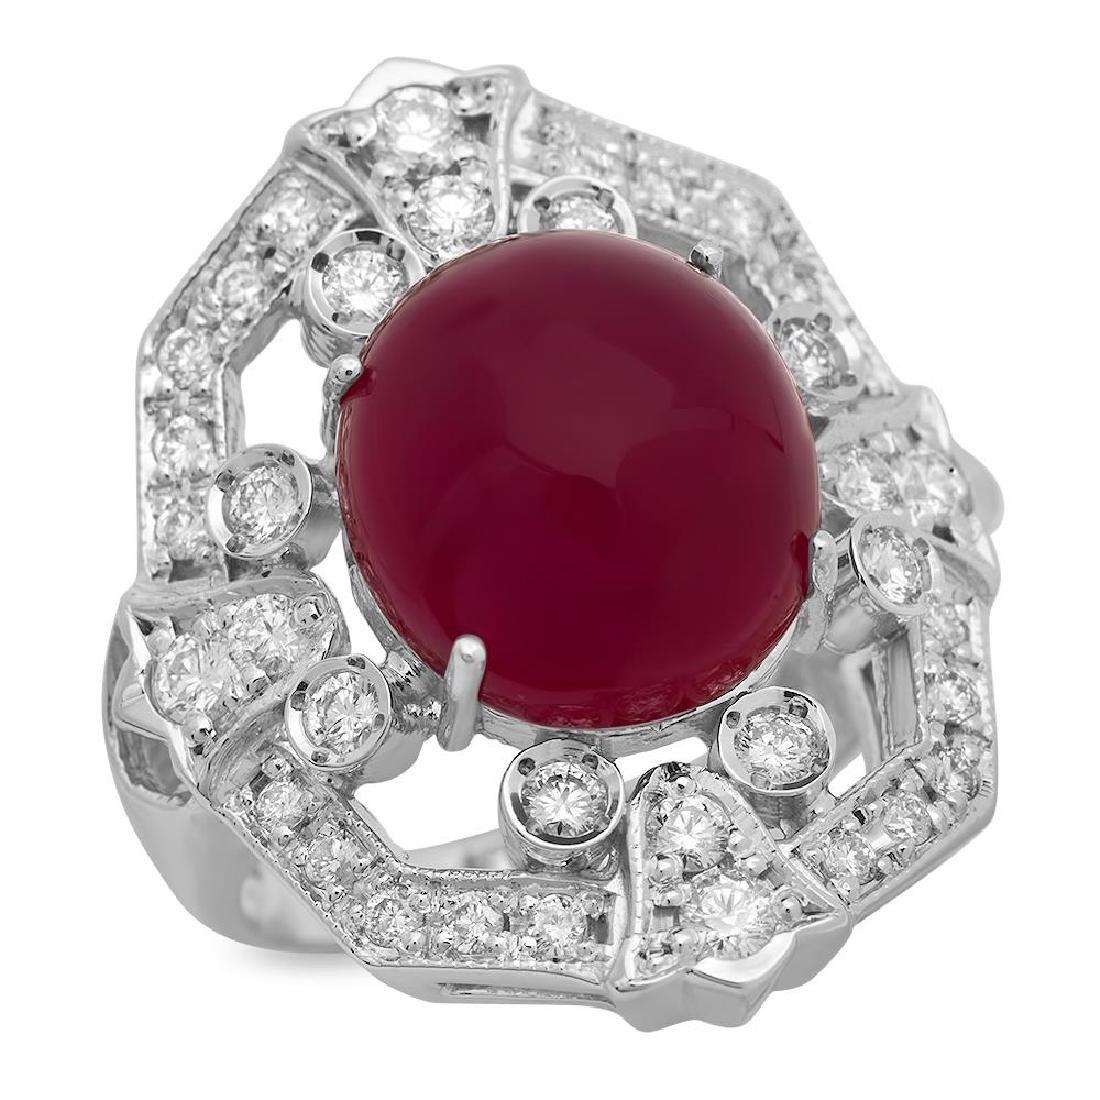 14K Gold 14.84ct Ruby 1.12ct Diamond Ring